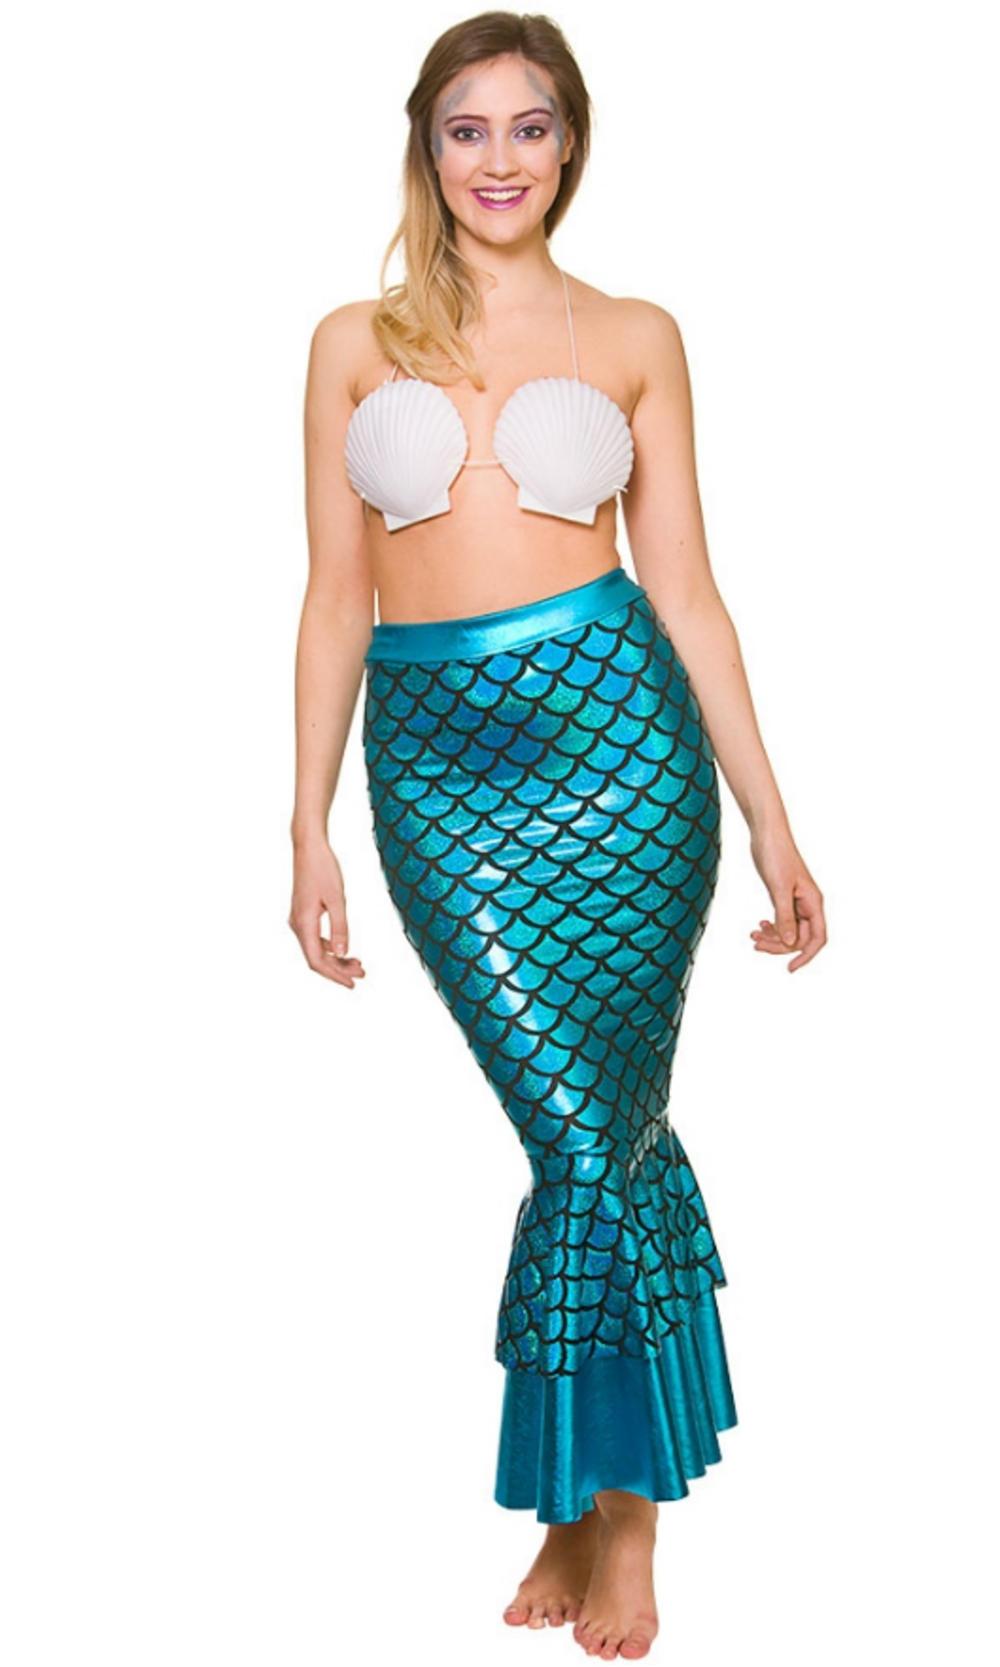 Mermaid Skirt Ladies Accessory | All Ladies Costumes | Mega Fancy Dress